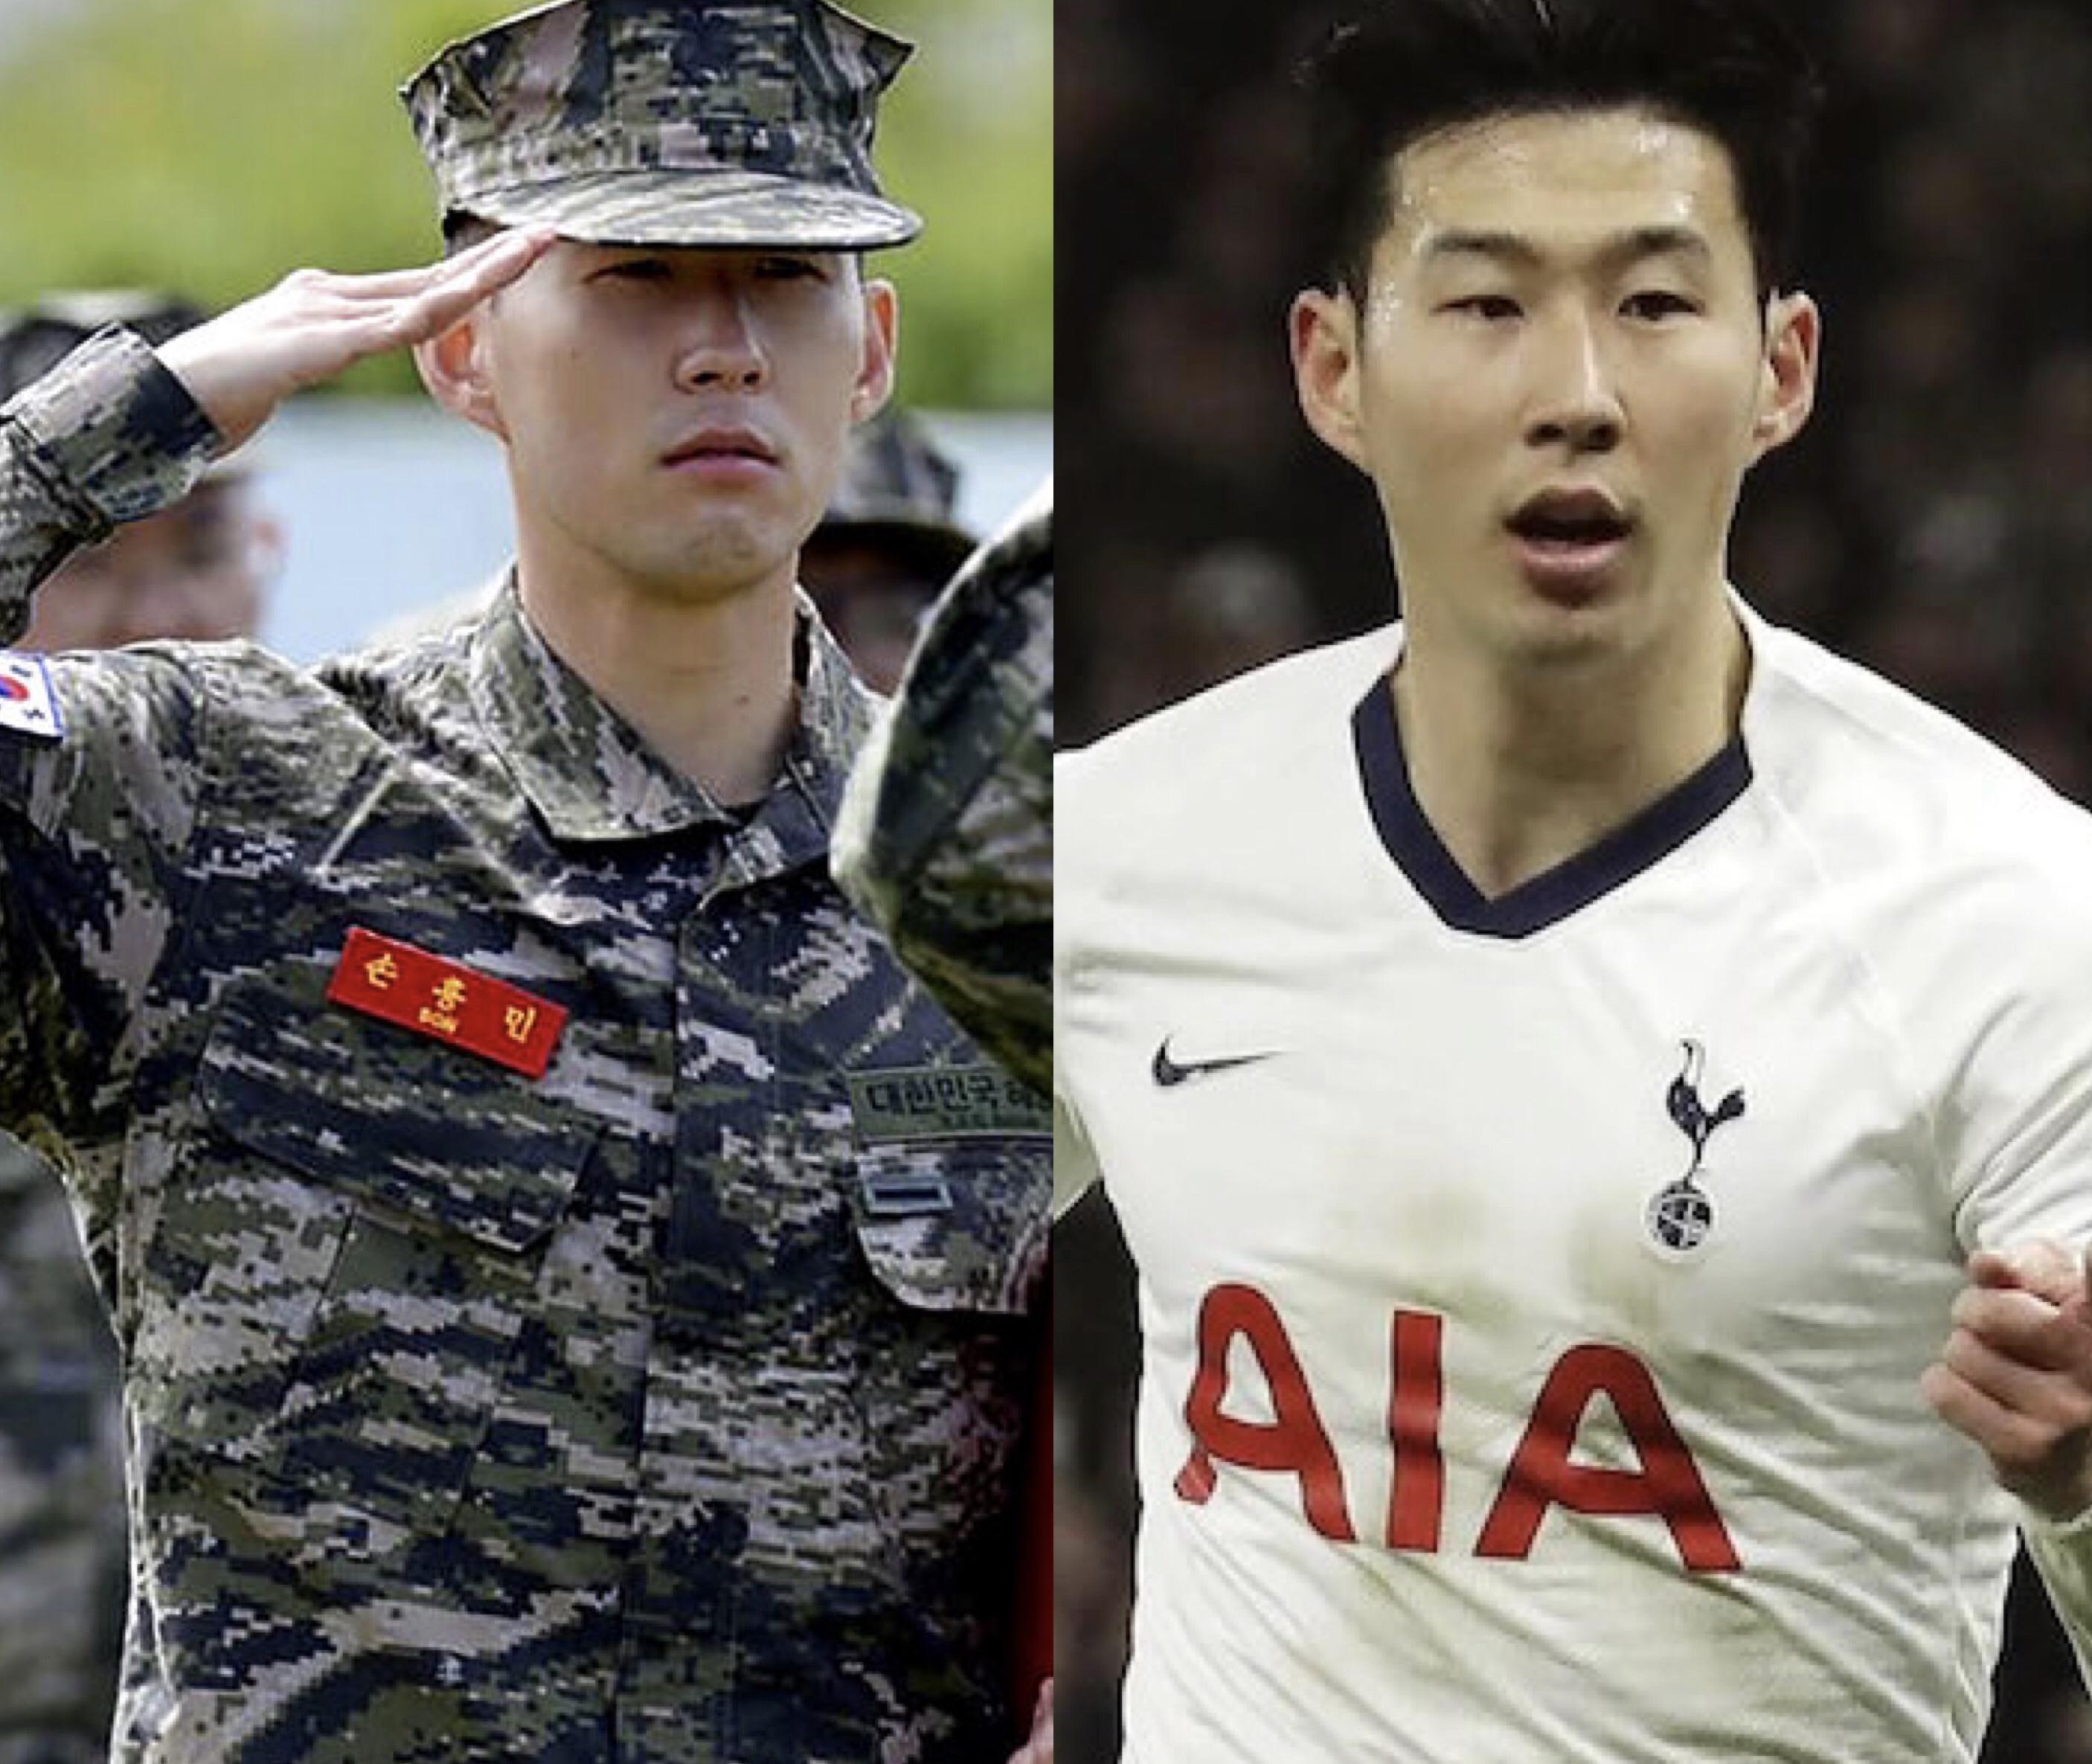 Son, Tottenham Hotspur player